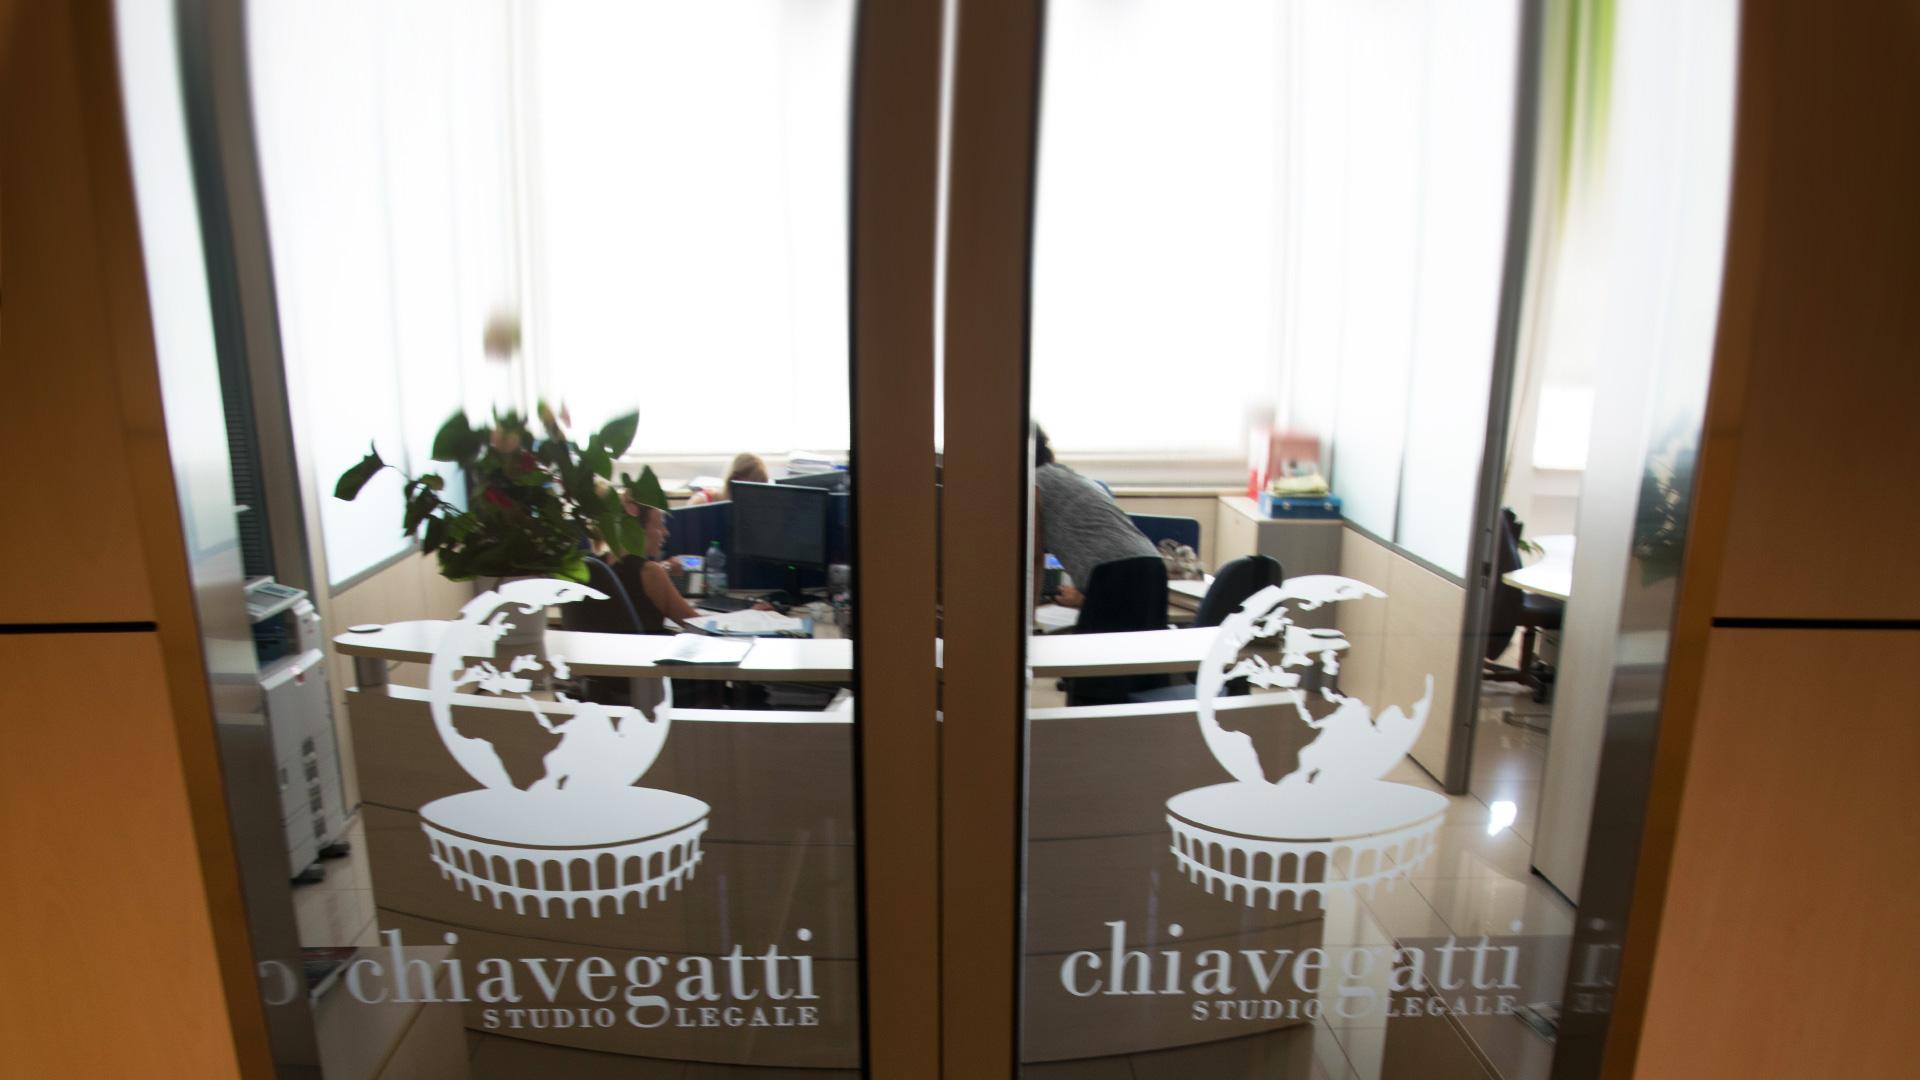 Chiavegatti & Chiavegatti